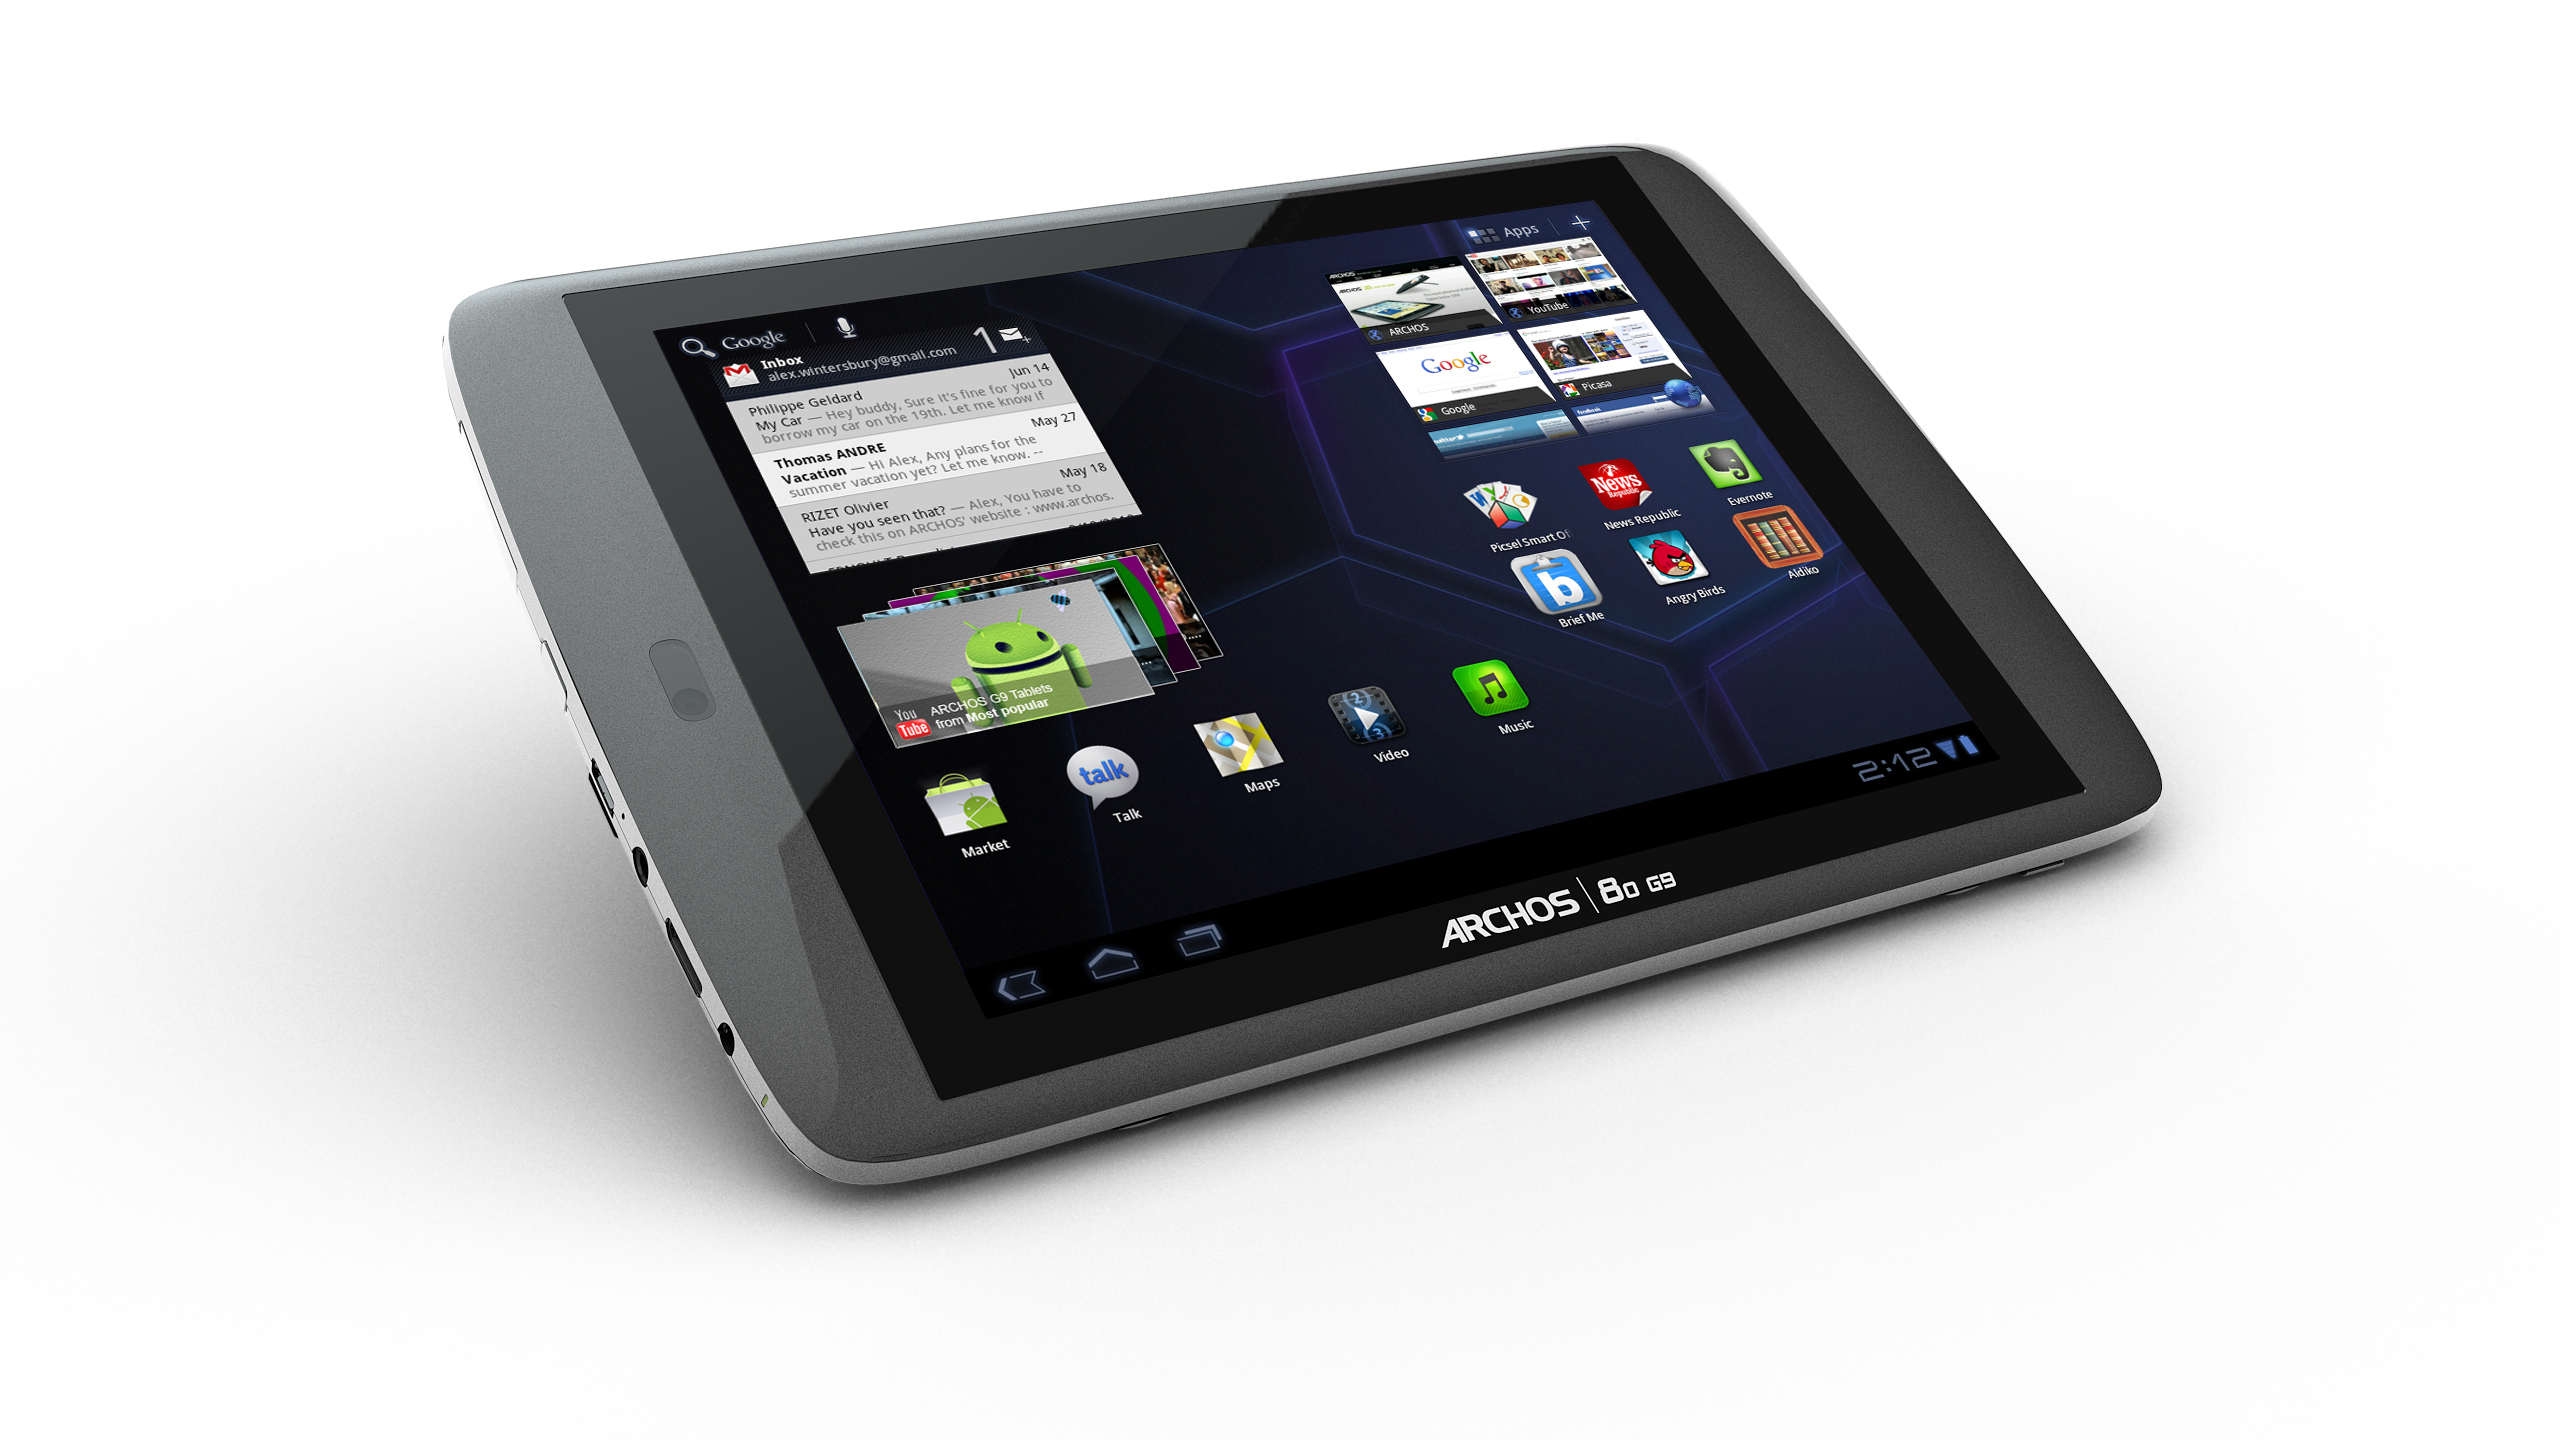 Archos 80 G9 Internet Tablet